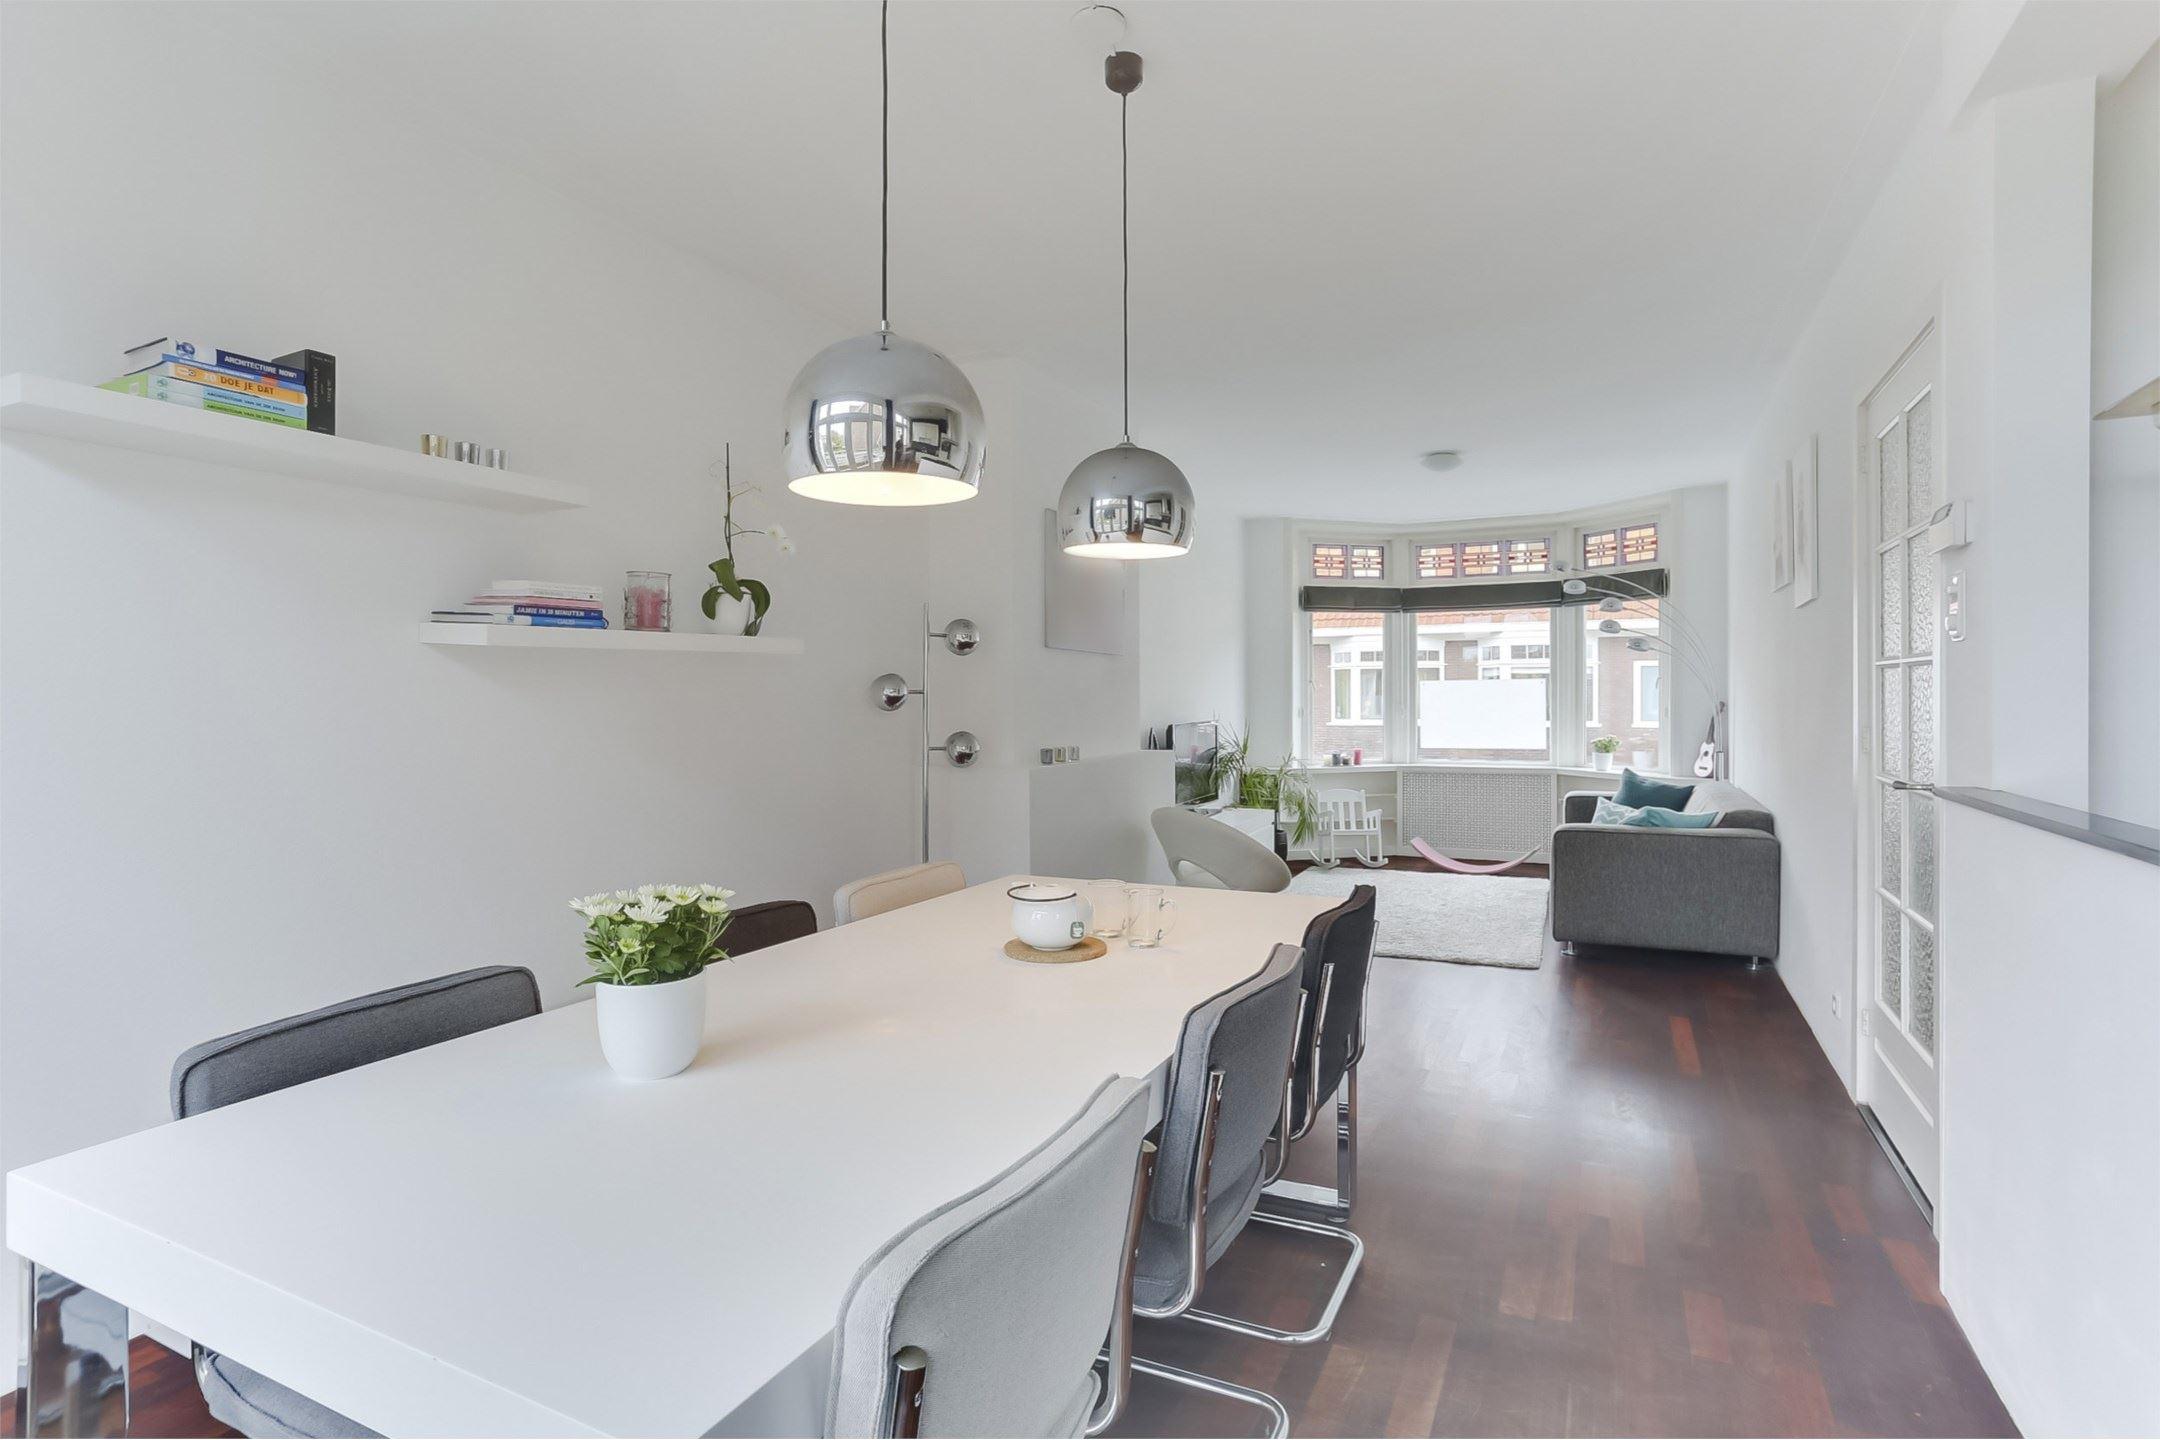 Appartement te koop: stuijvesantstraat 77 rood 2023 km haarlem [funda]